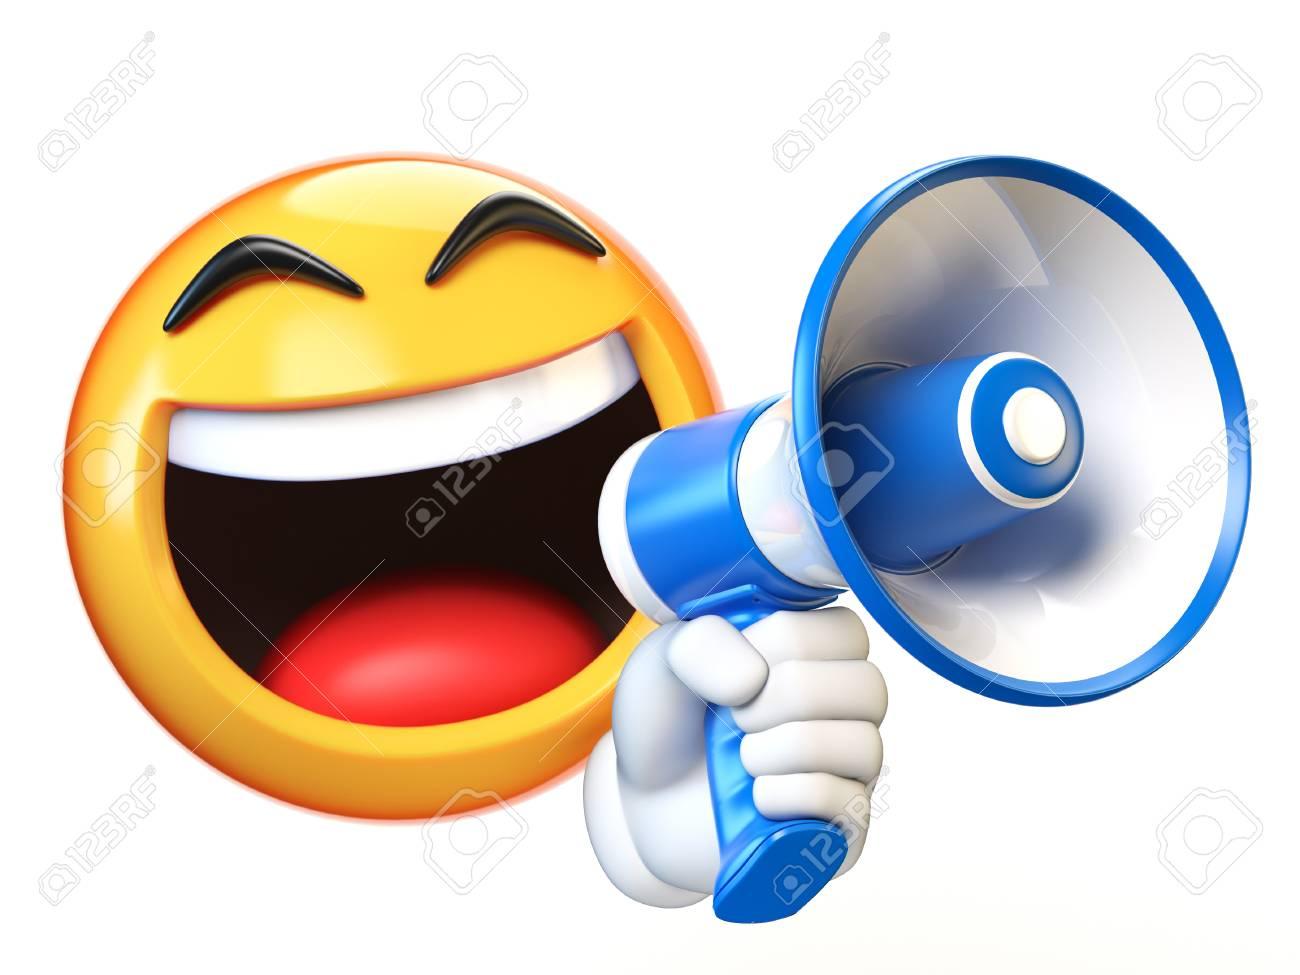 Emoji holding loudspeaker isolated on white background, emoticon holding megaphone 3d rendering - 101617116